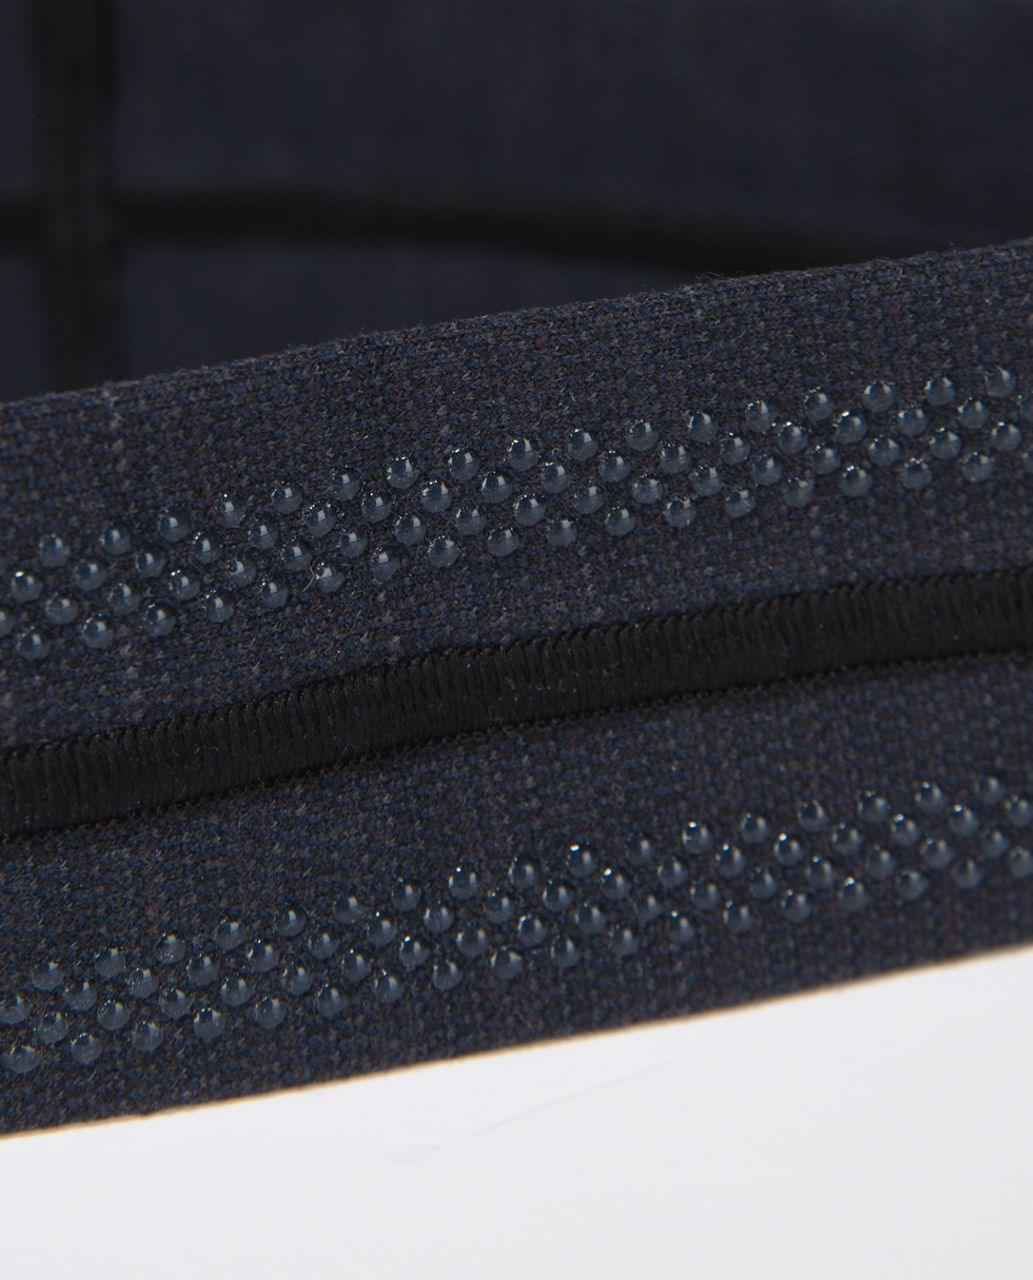 Lululemon Fly Away Tamer Headband - Luon Pique Inkwell Black